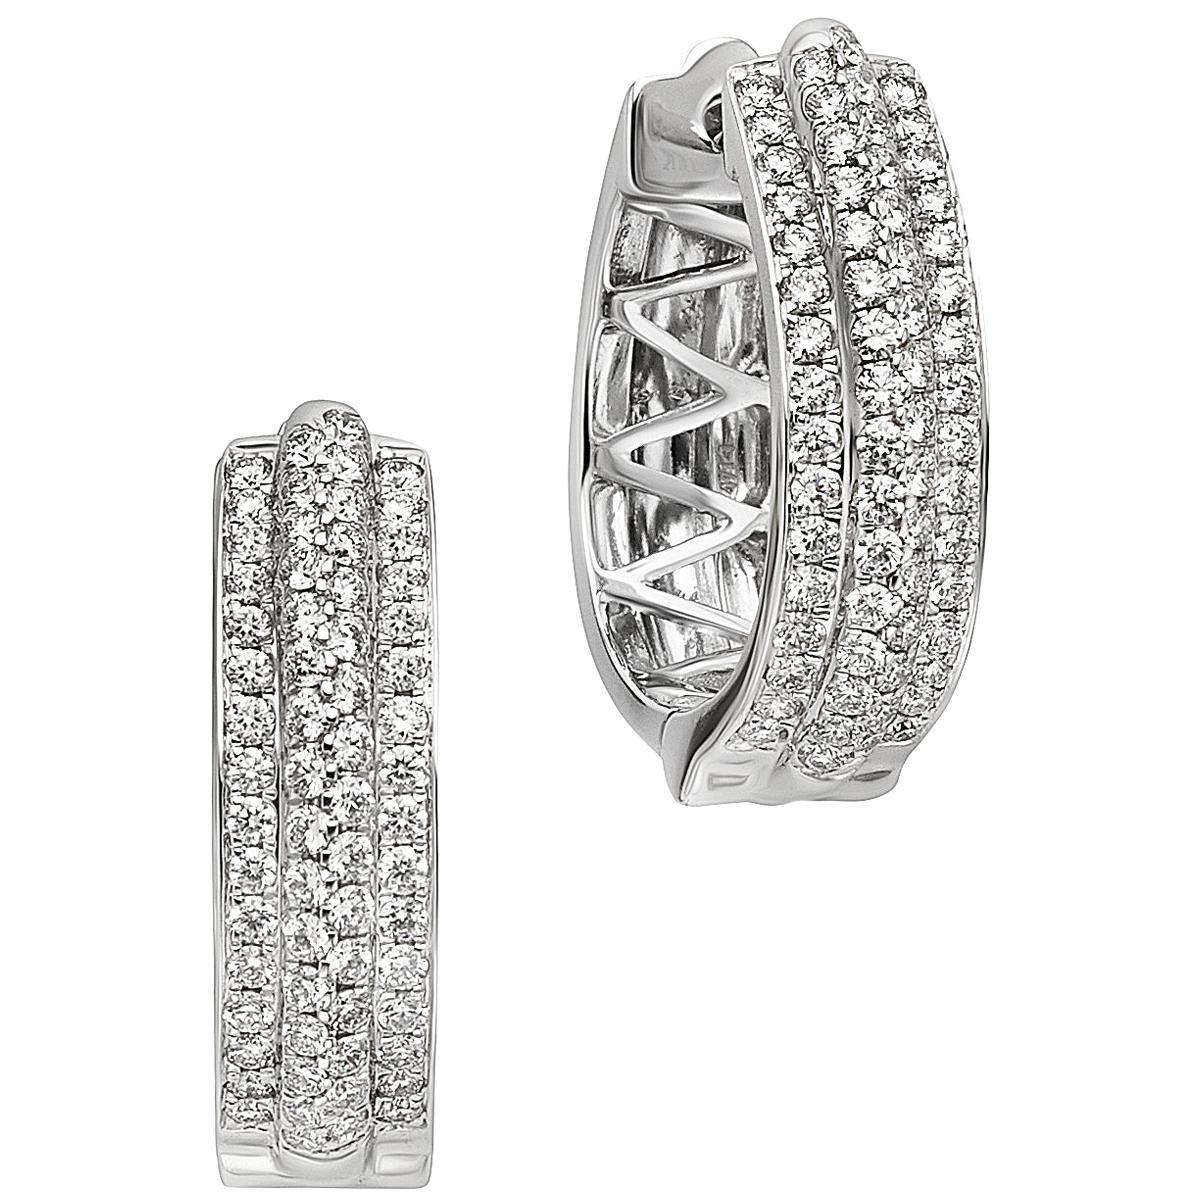 1.28 Carat Diamond and 14 Karat White Gold Hoop Earrings